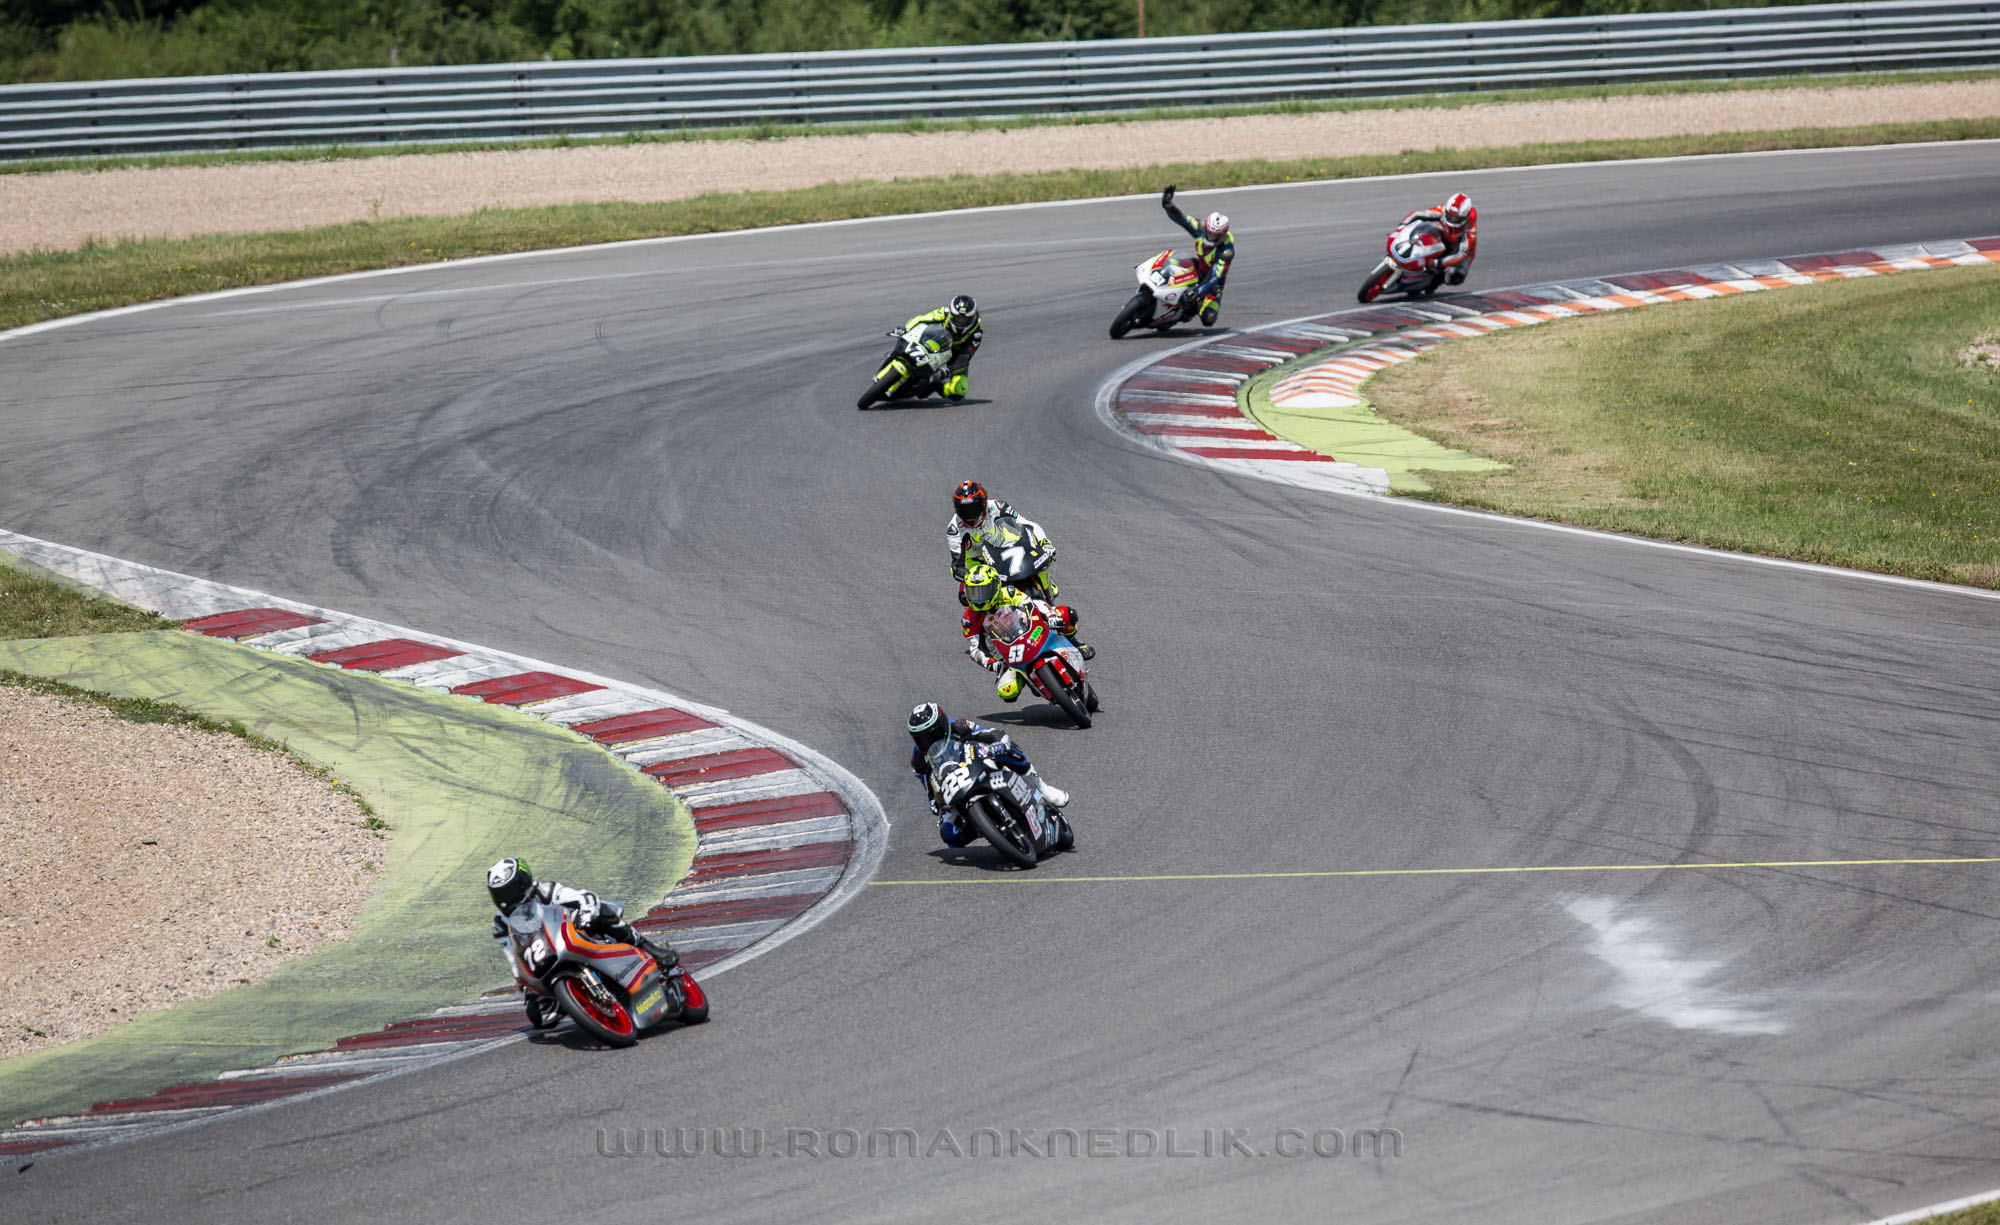 Alpe_Adria_European_Championship-20